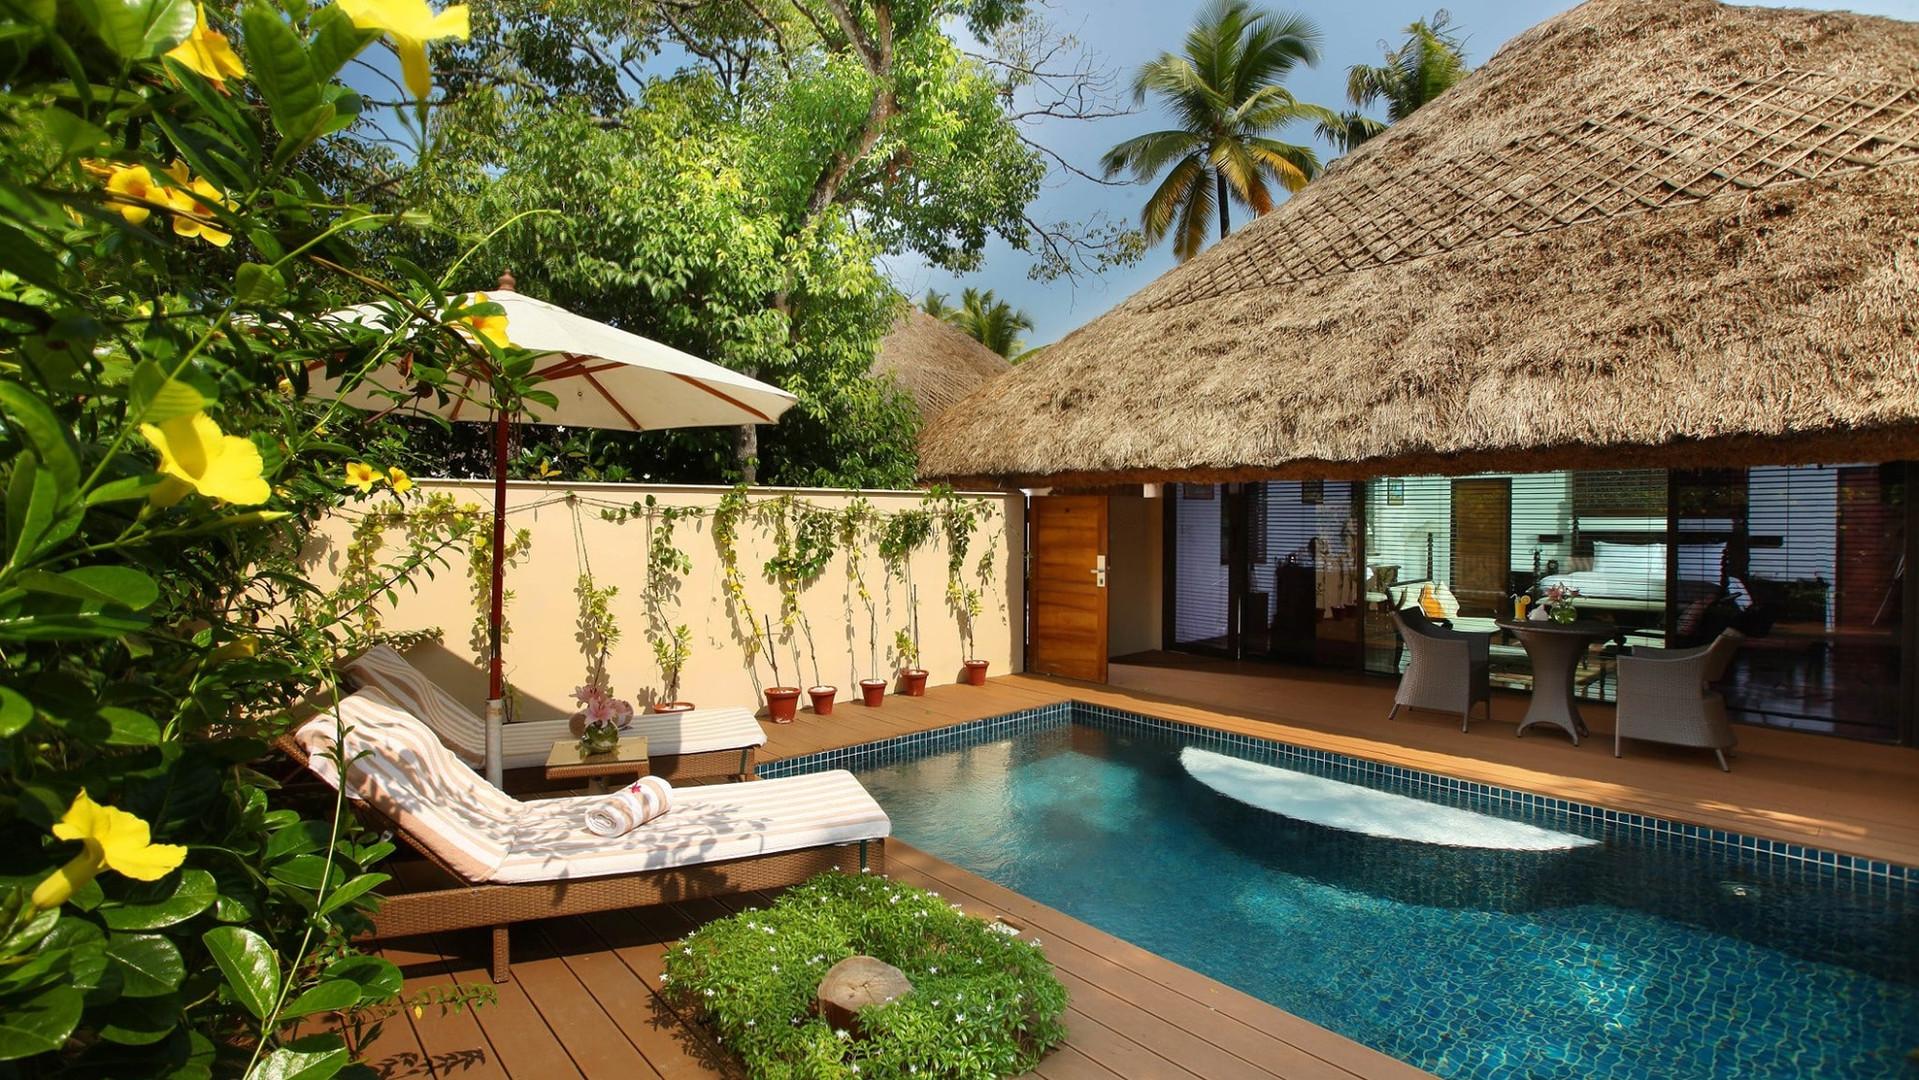 Semantha Pool Villa